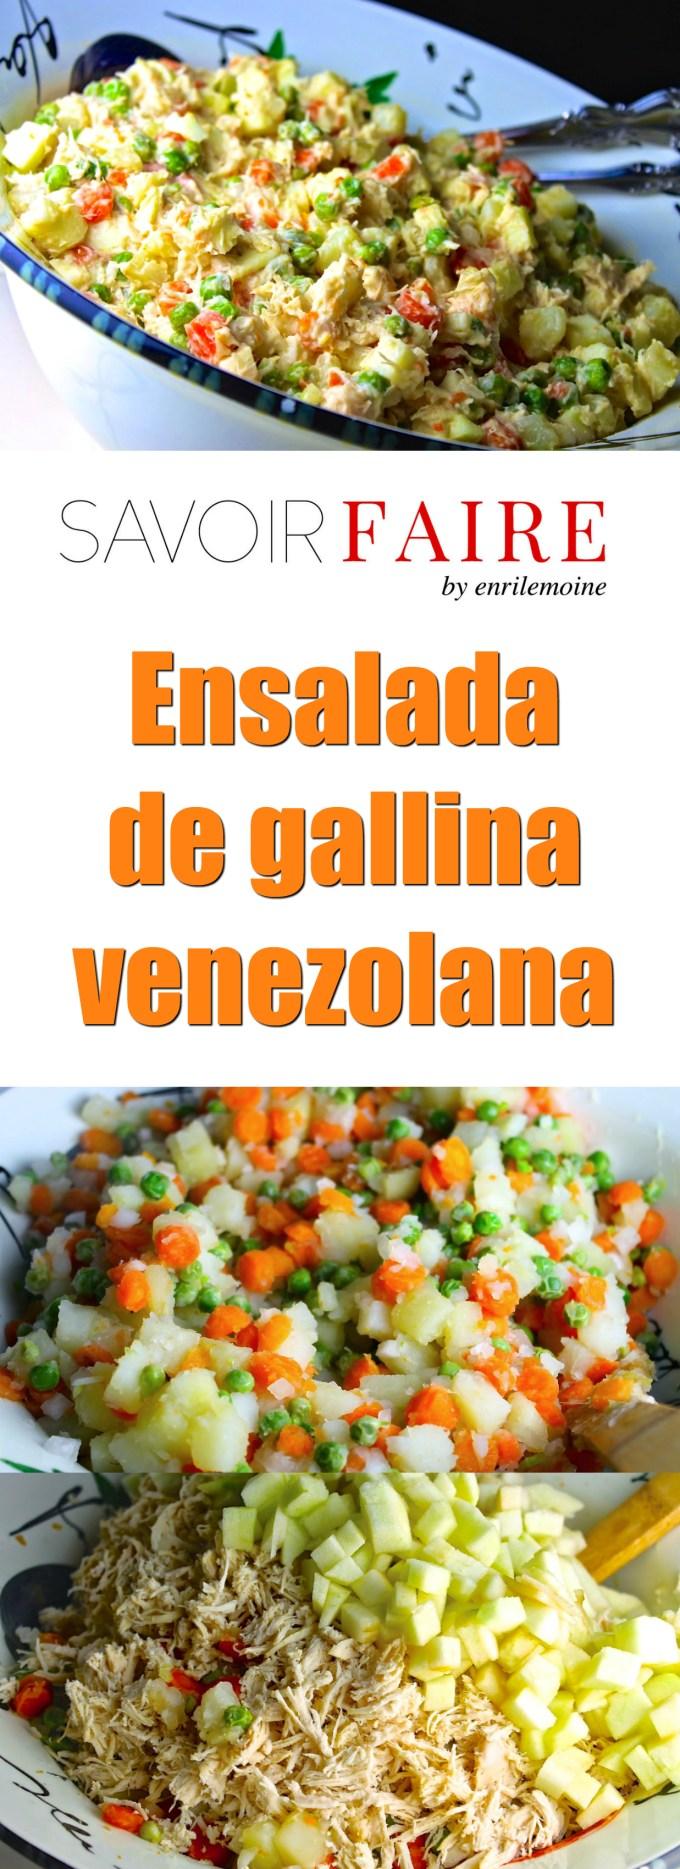 Ensalada de gallina - SAVOIR FAIRE by enrilemoine